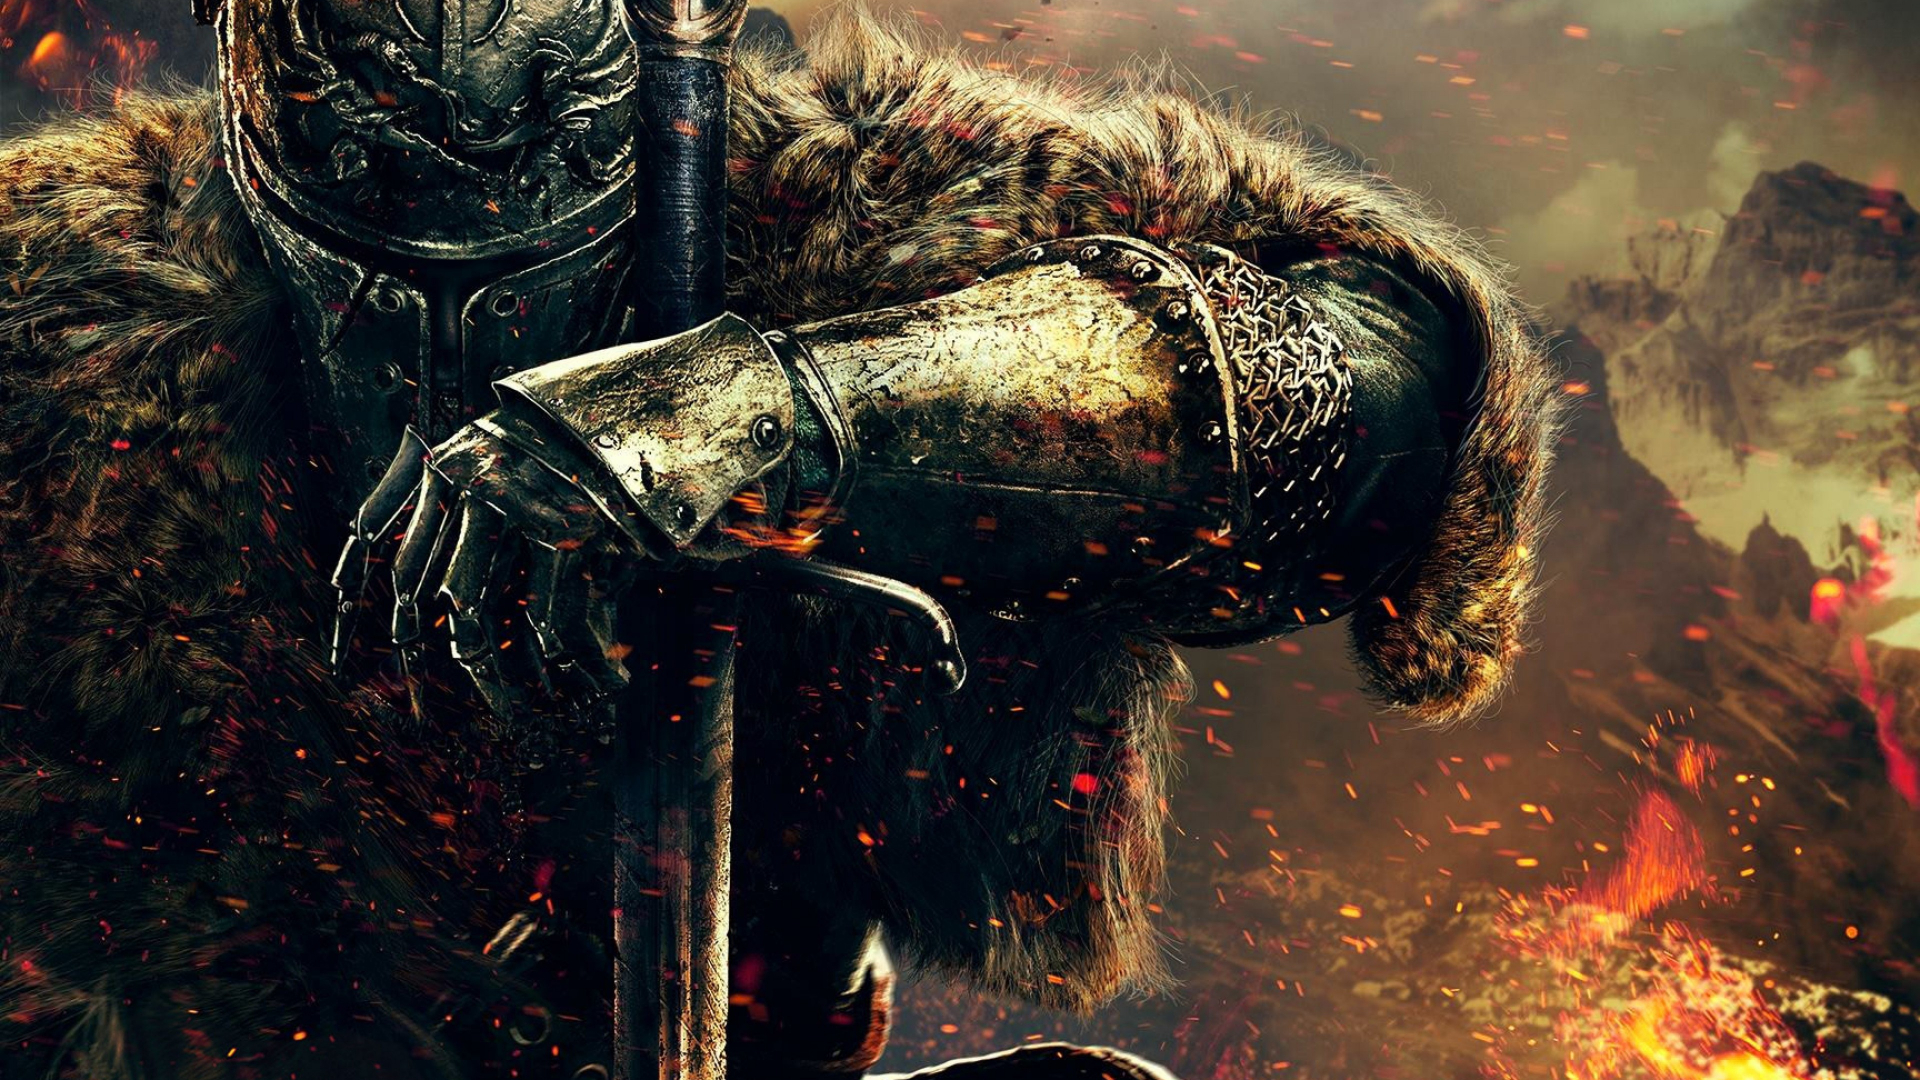 Free download Dark Souls 2 4K Game Wallpaper 4K Wallpaper ...